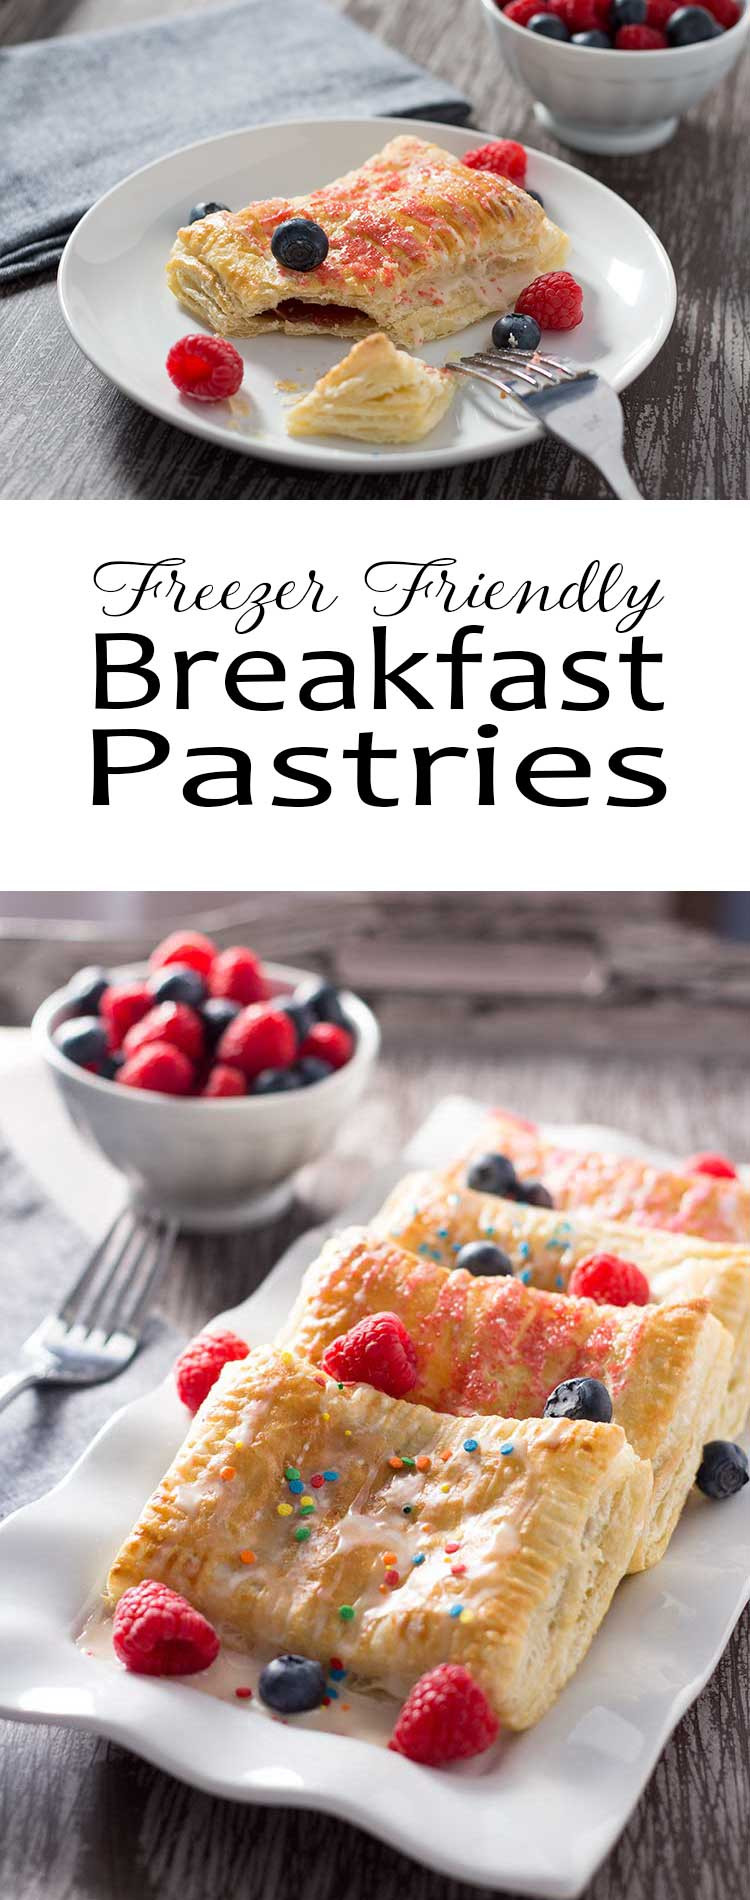 Easy Breakfast Pastries  Easy Breakfast Pastries